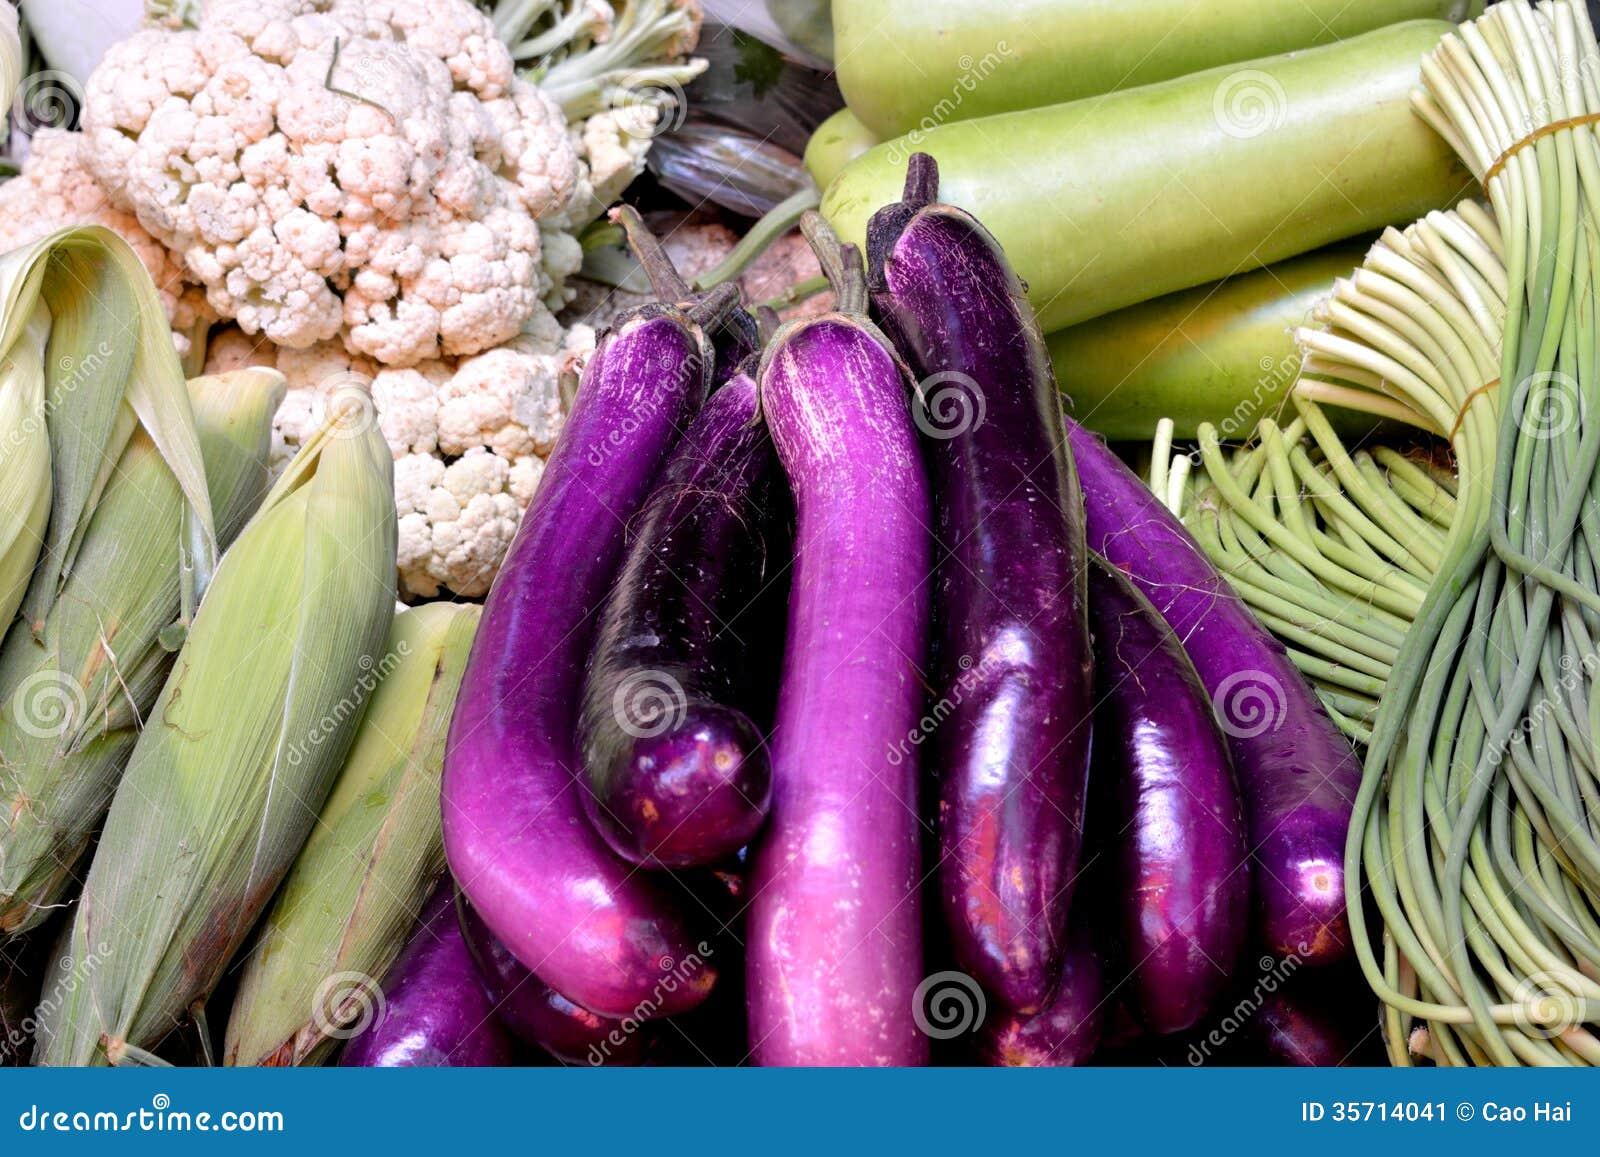 how to cook purple eggplant